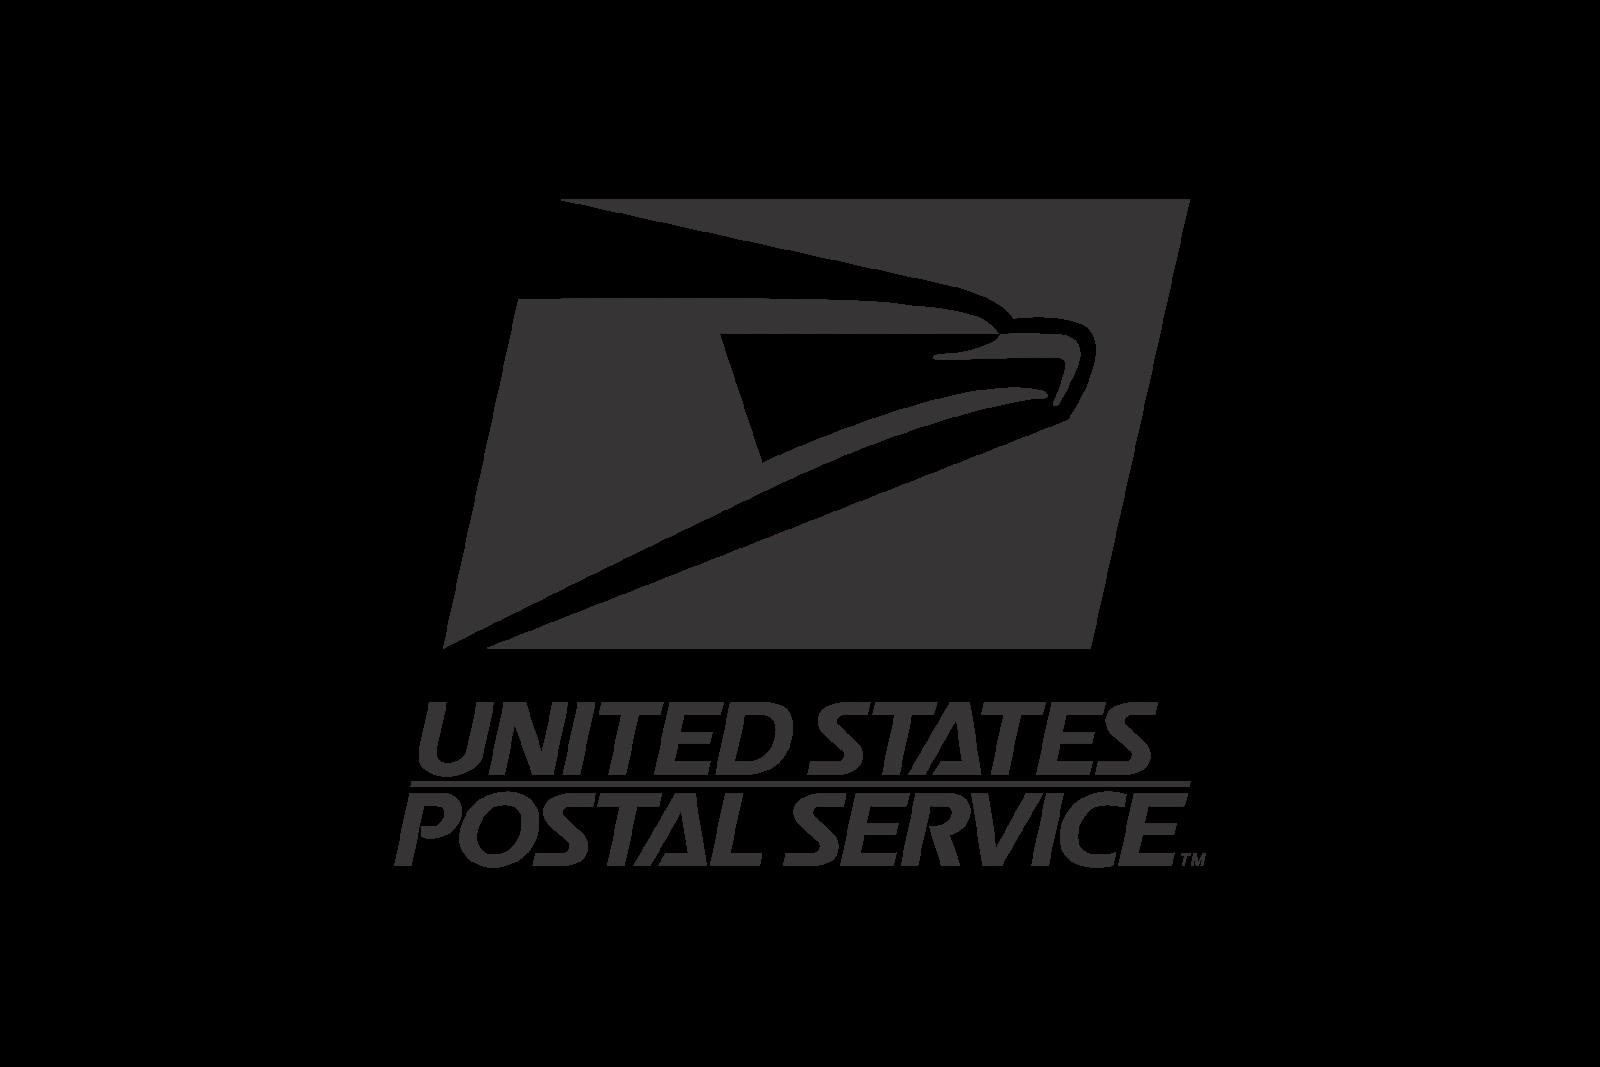 United states postal service logo logo share united states postal service logo buycottarizona